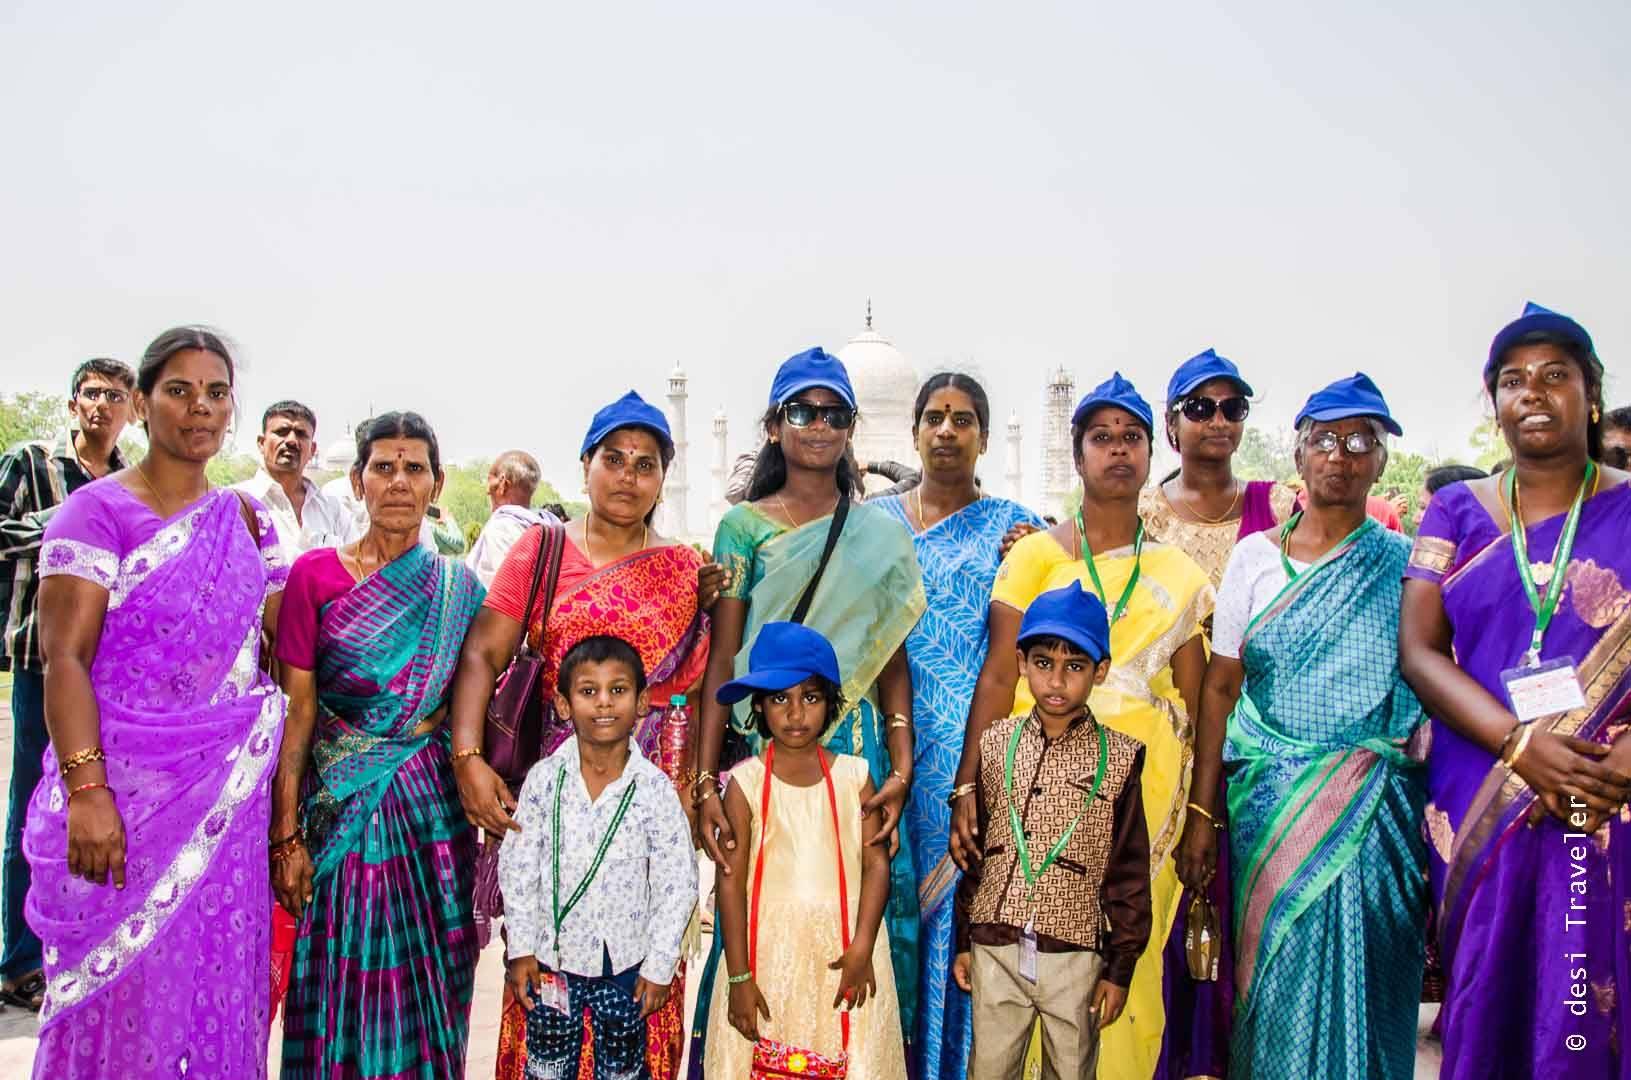 Women traveler Taj Mahal Agra